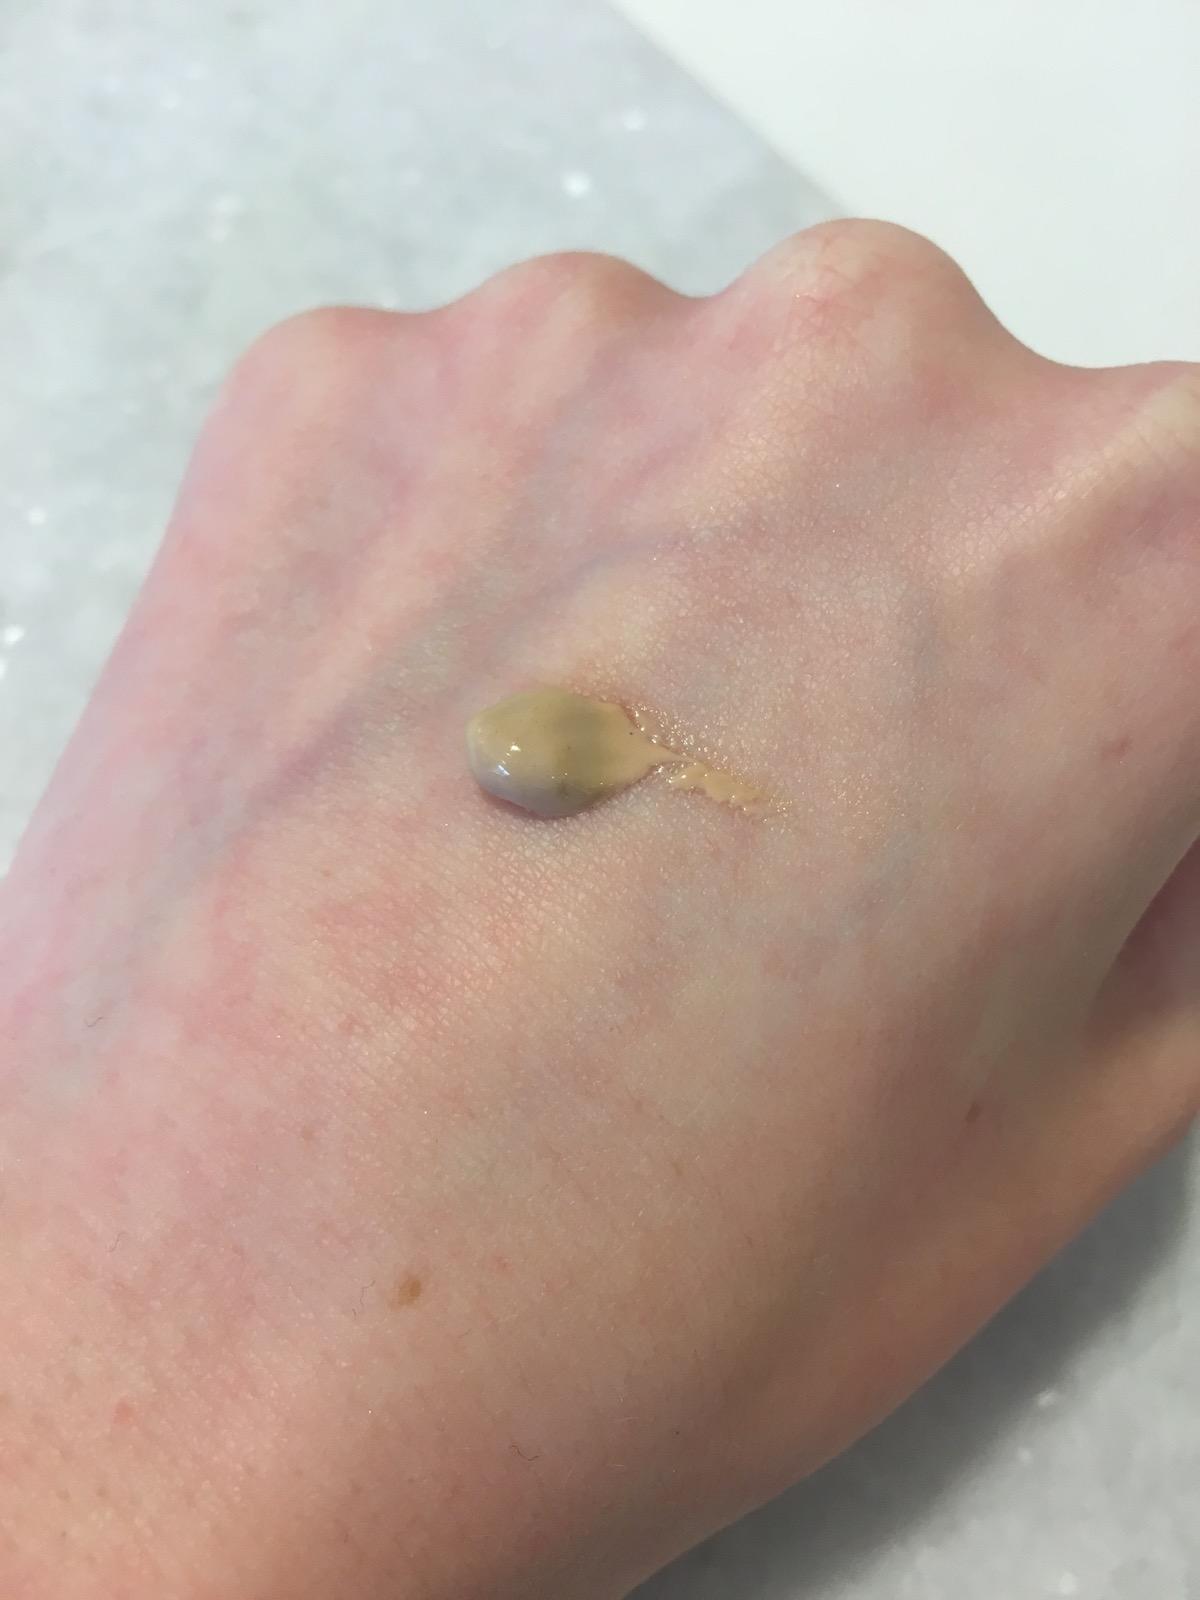 PCA SKIN Skincare skonhetssnack.se IMG_1500